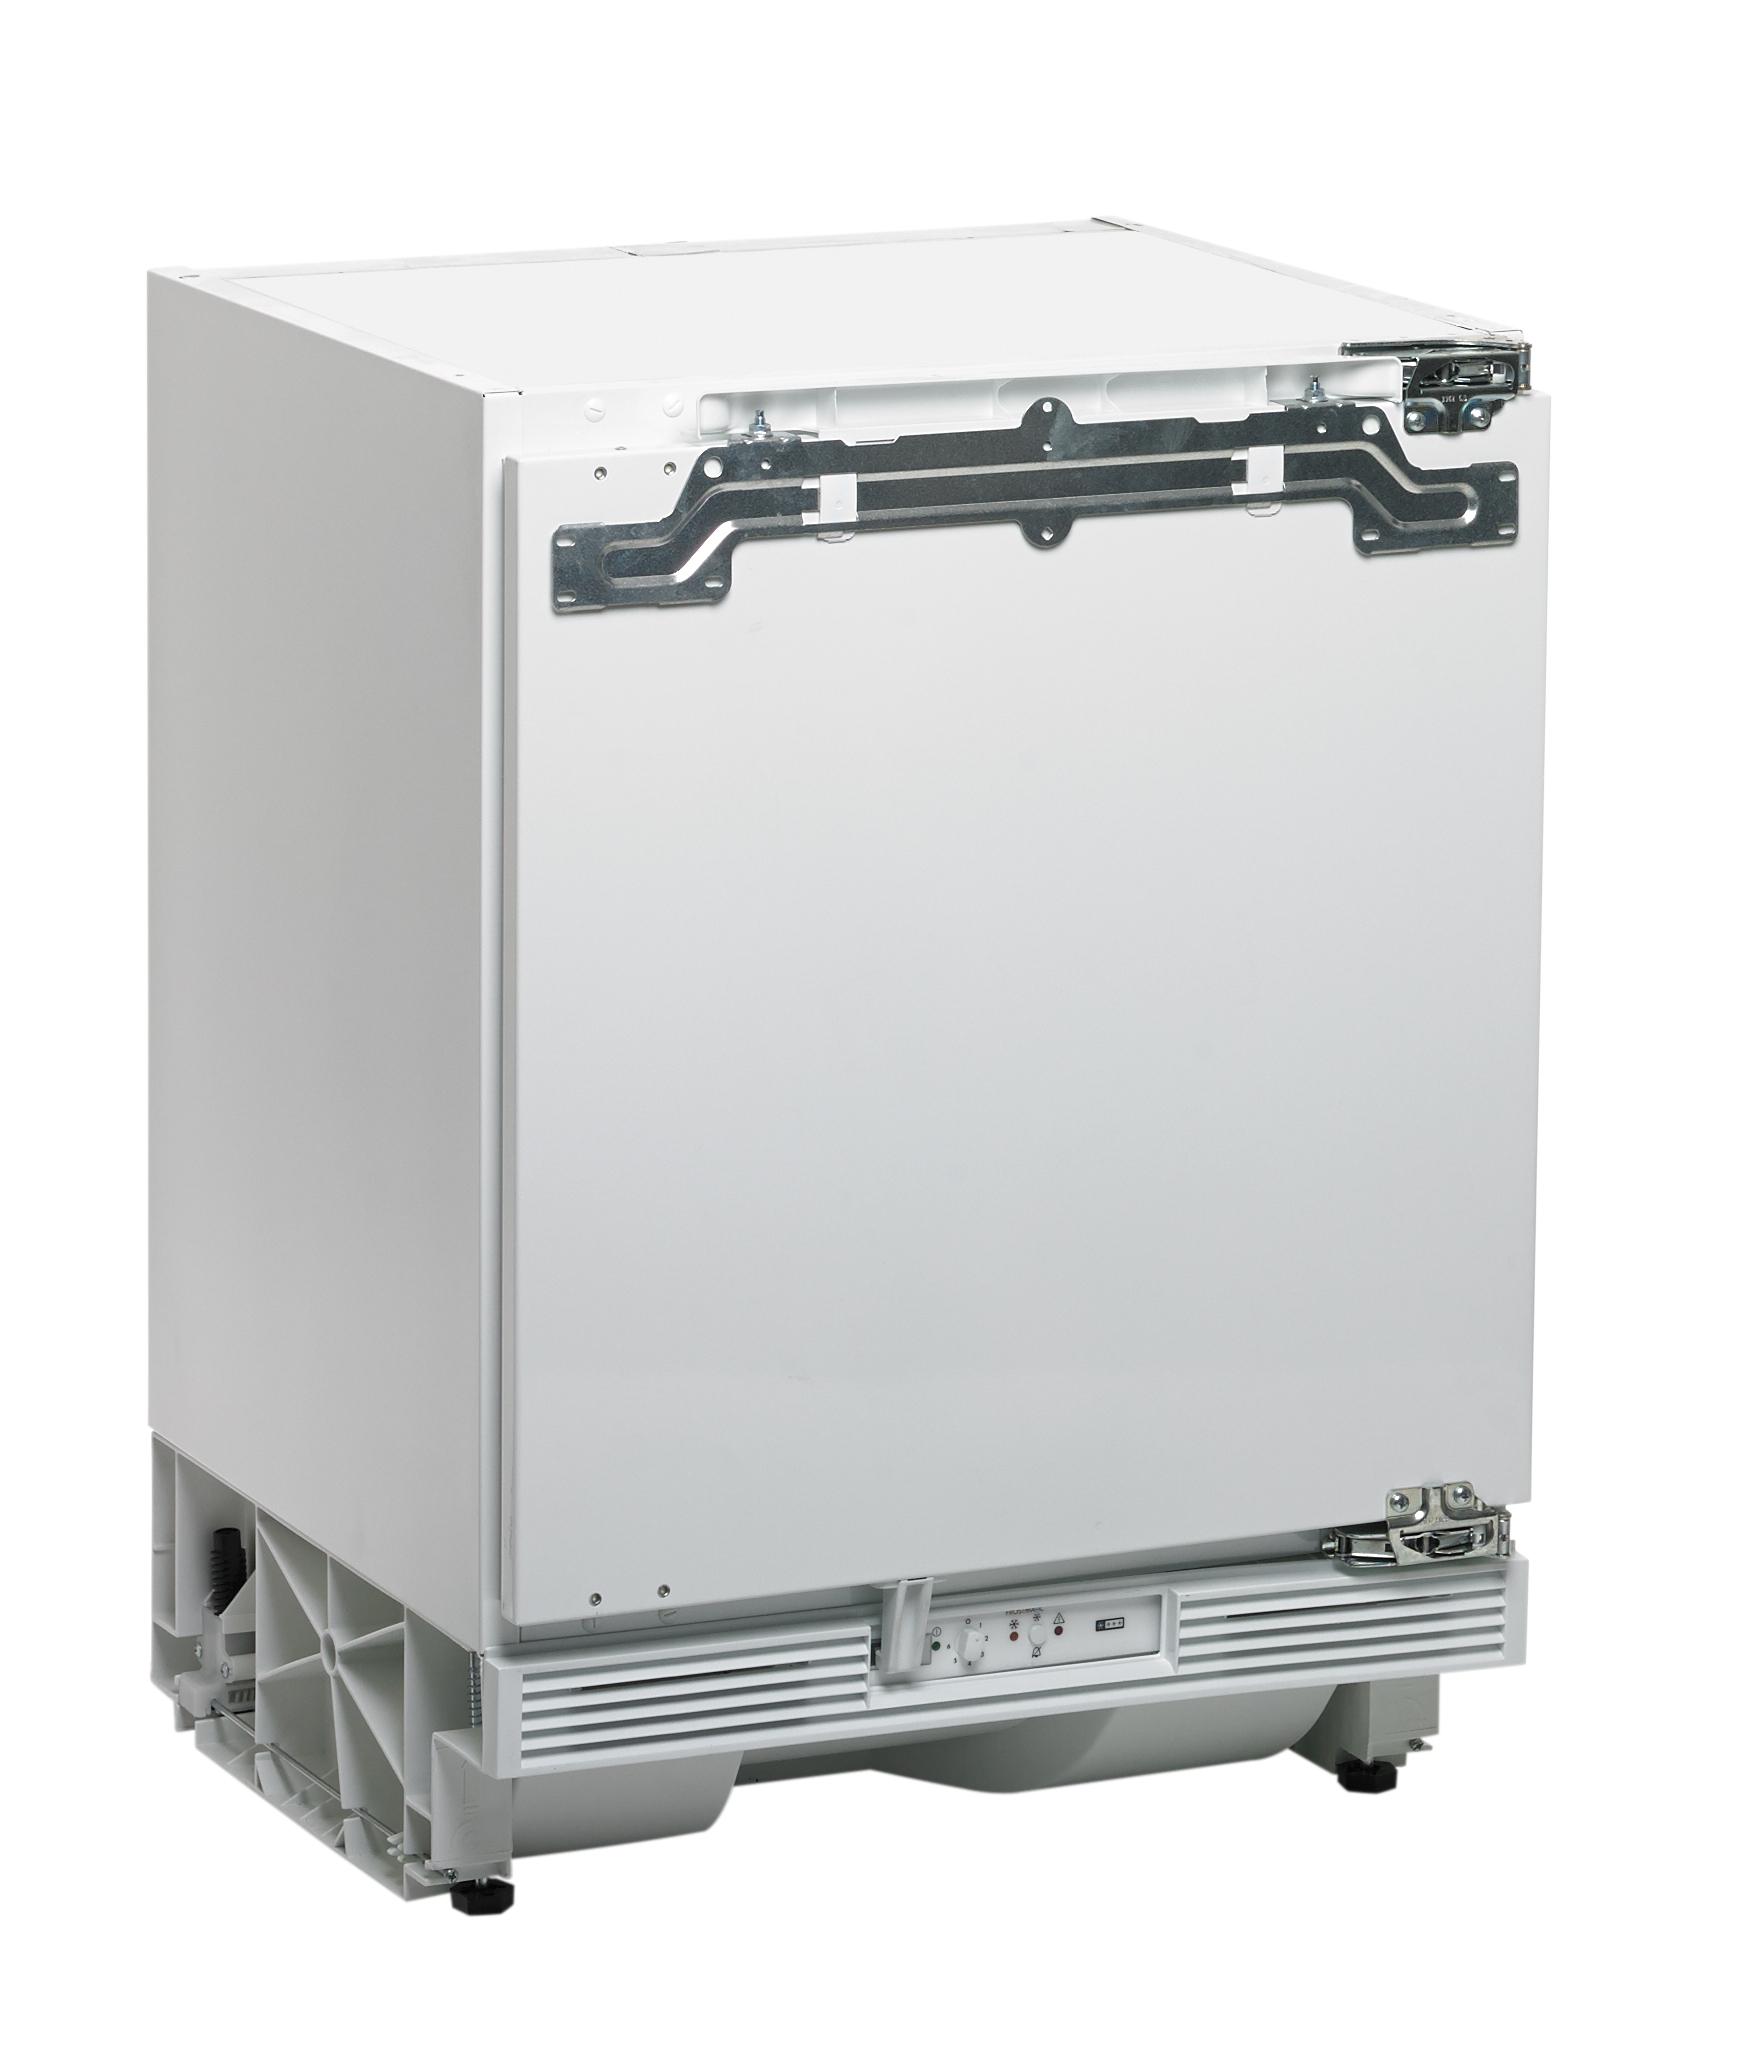 coolmatic hdc 150 df / tk-schrank .. - dometic werksverkauf